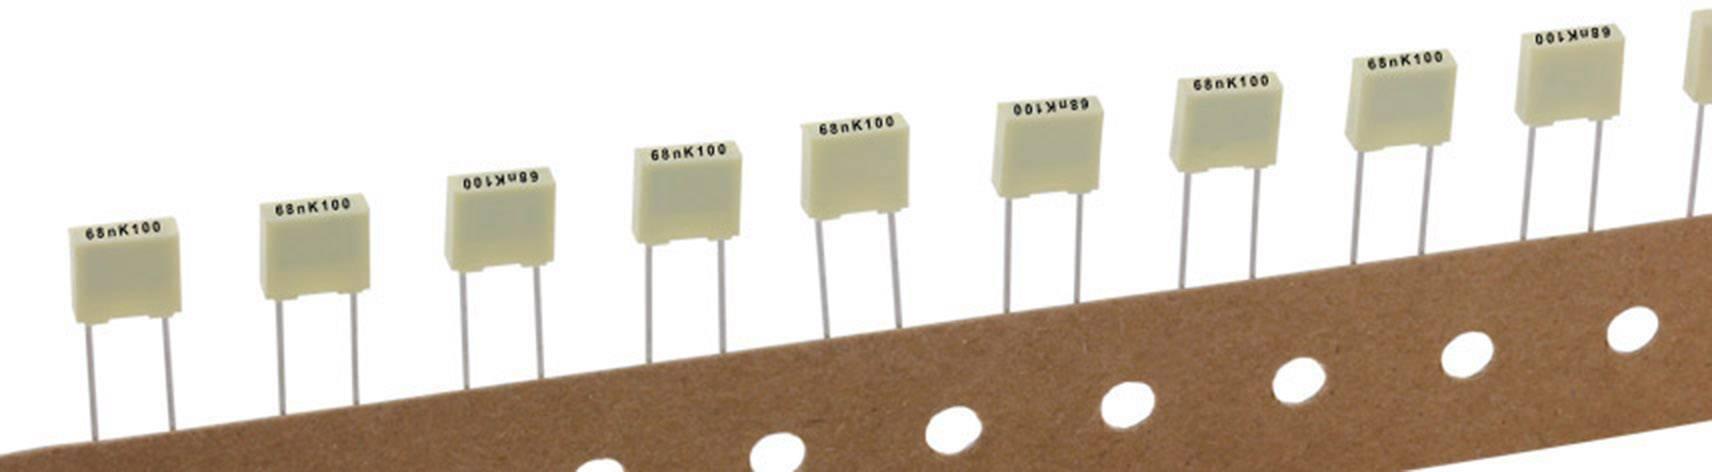 Polyesterový kondenzátor Kemet R82EC2330DQ50K+ radiální, 33 nF, 100 V,10 %, 5 mm, (d x š x v) 7.2 x 2.5 mm x 6.5 mm, 1 ks